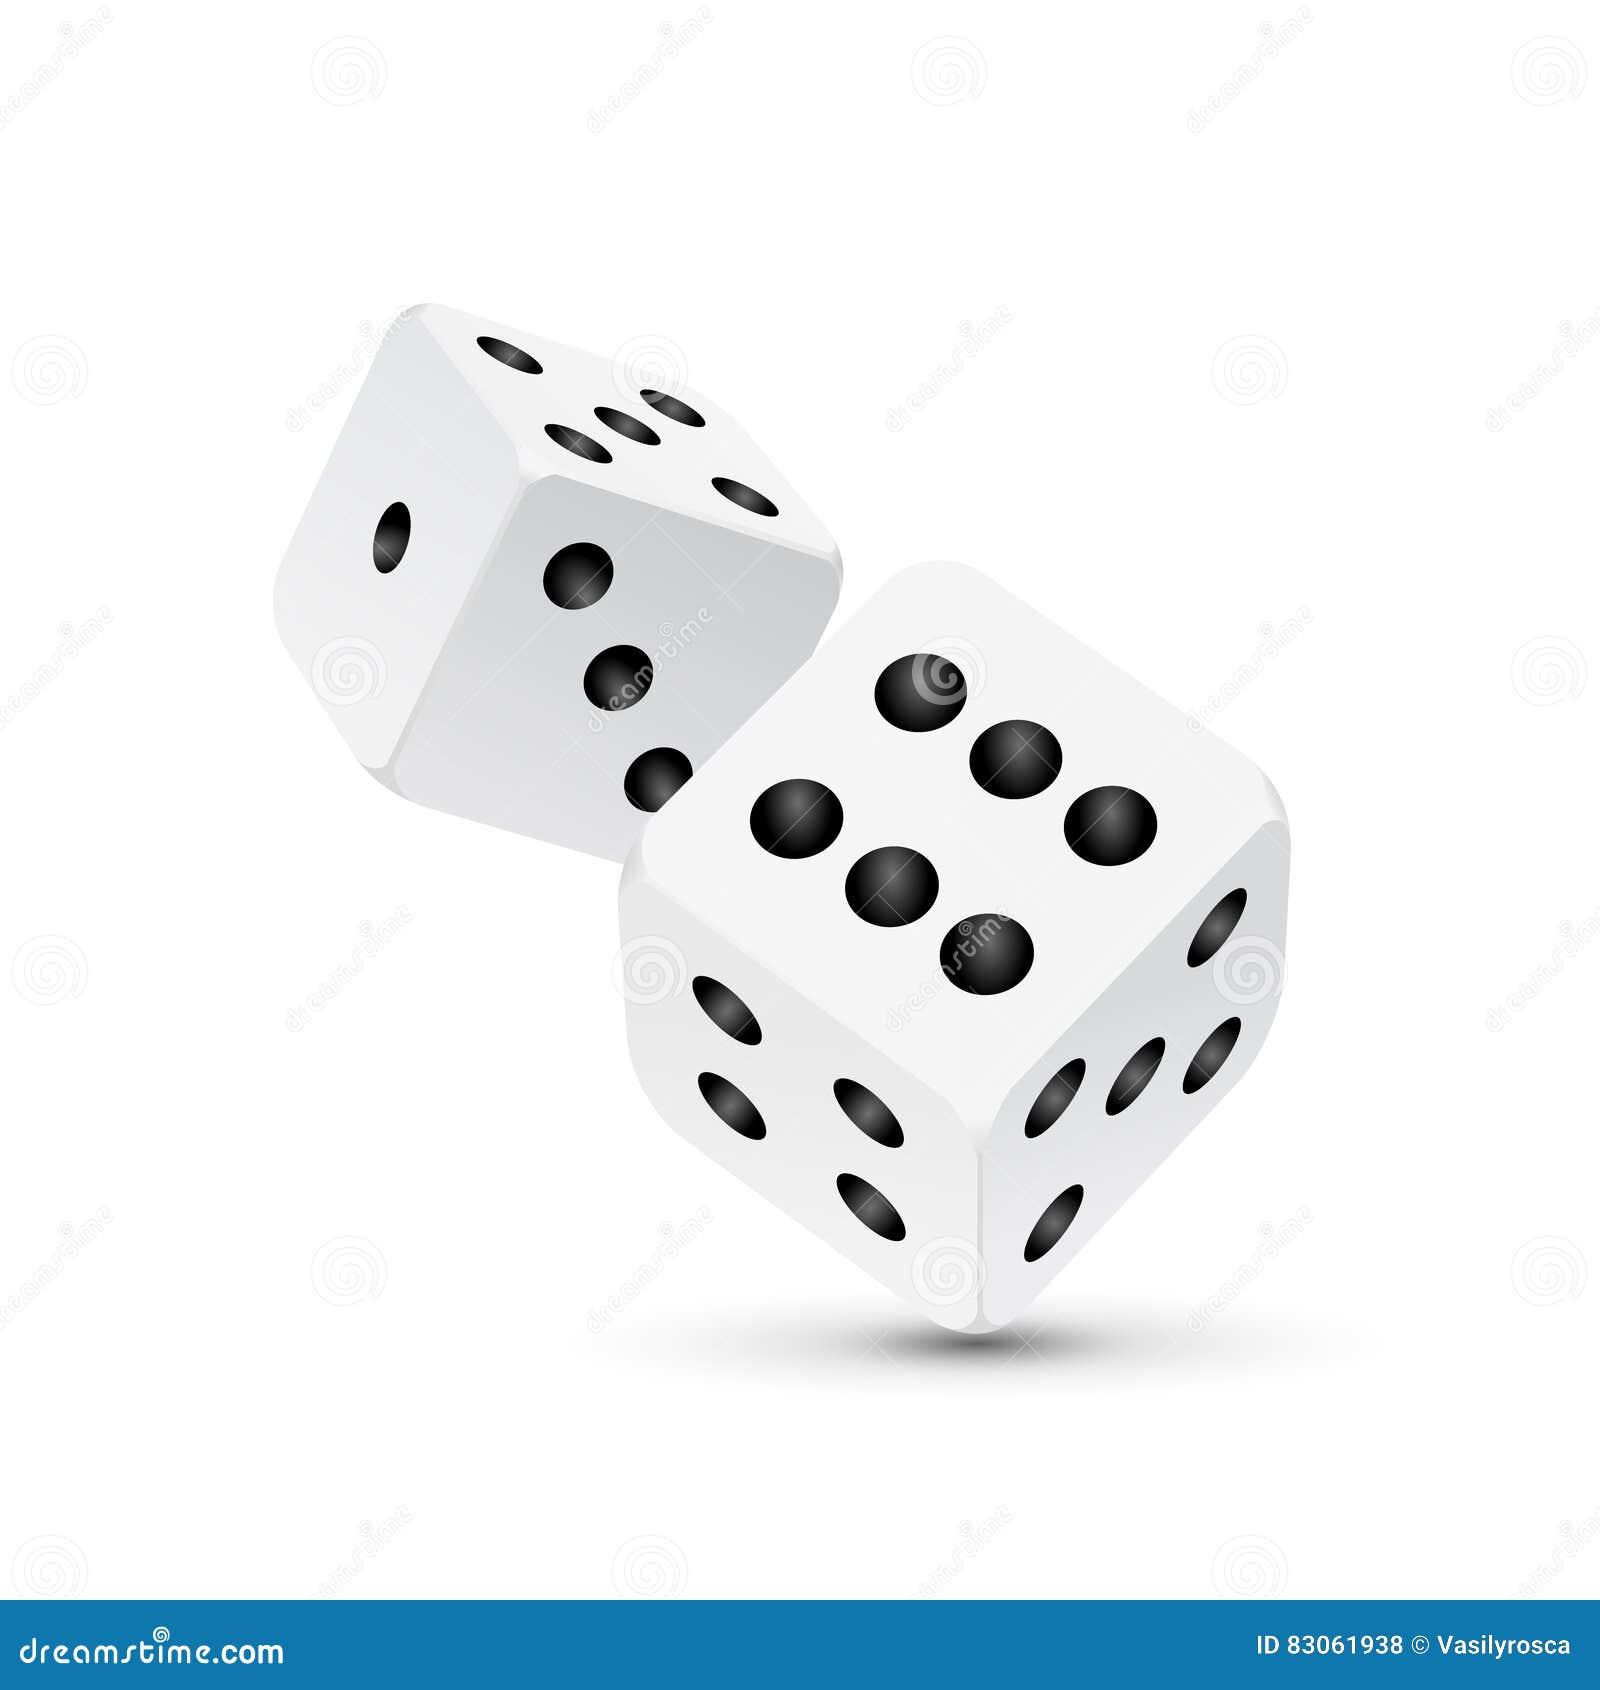 New york state gambling constitutional amendment